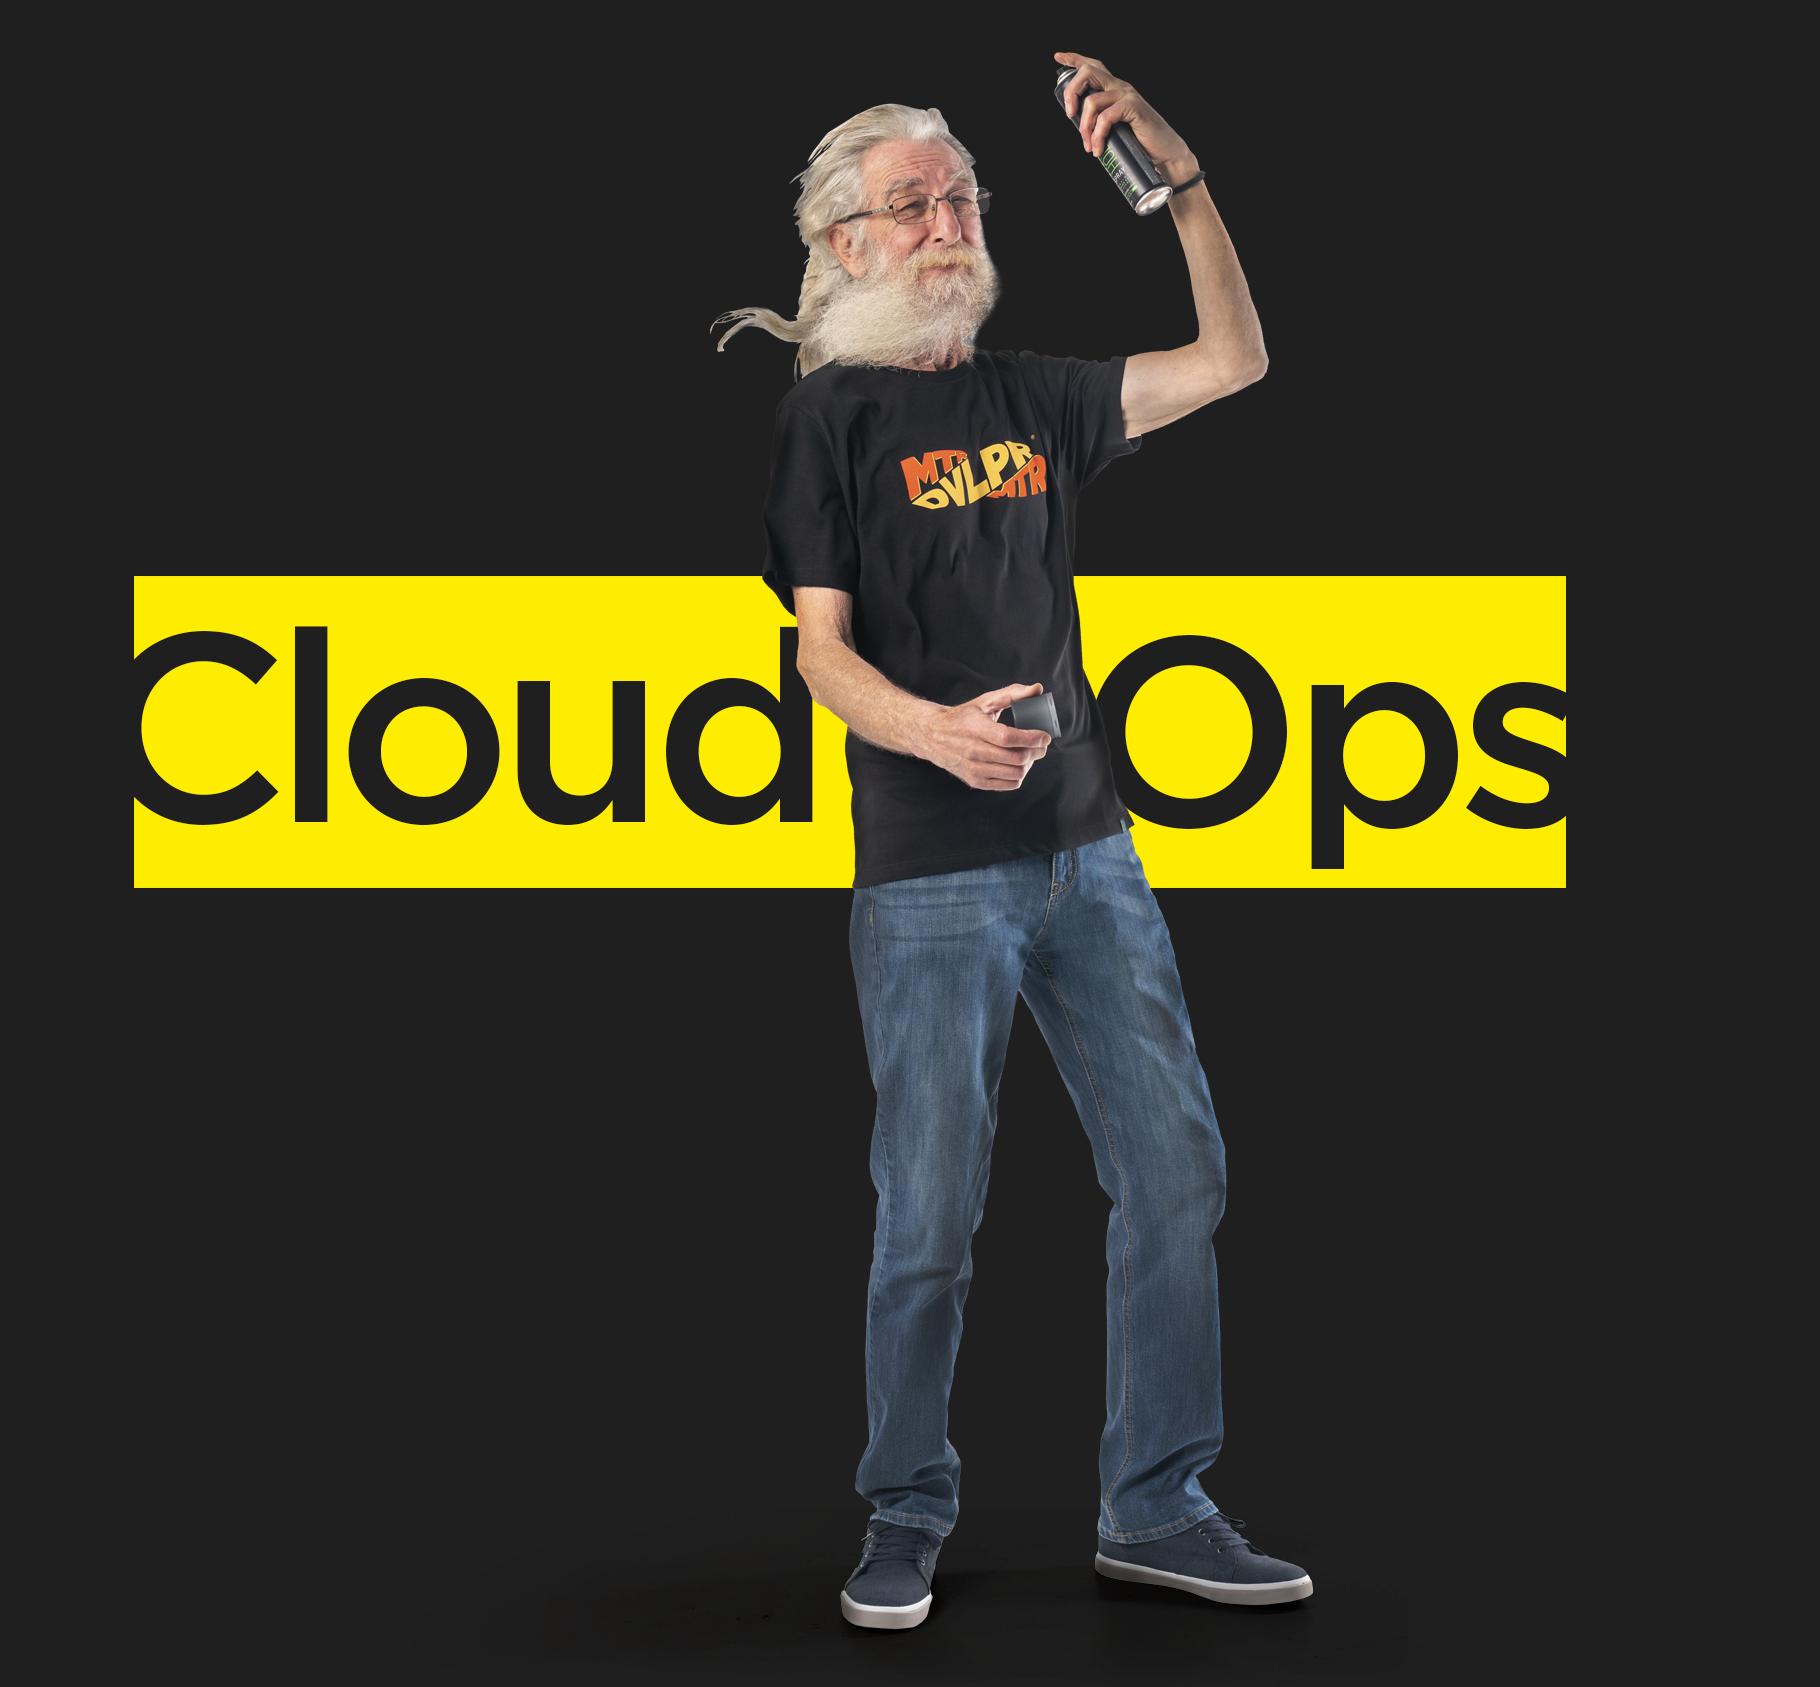 cloudops, Cloud Ops. Otvorene pozicije – Junior, Mid, Senior